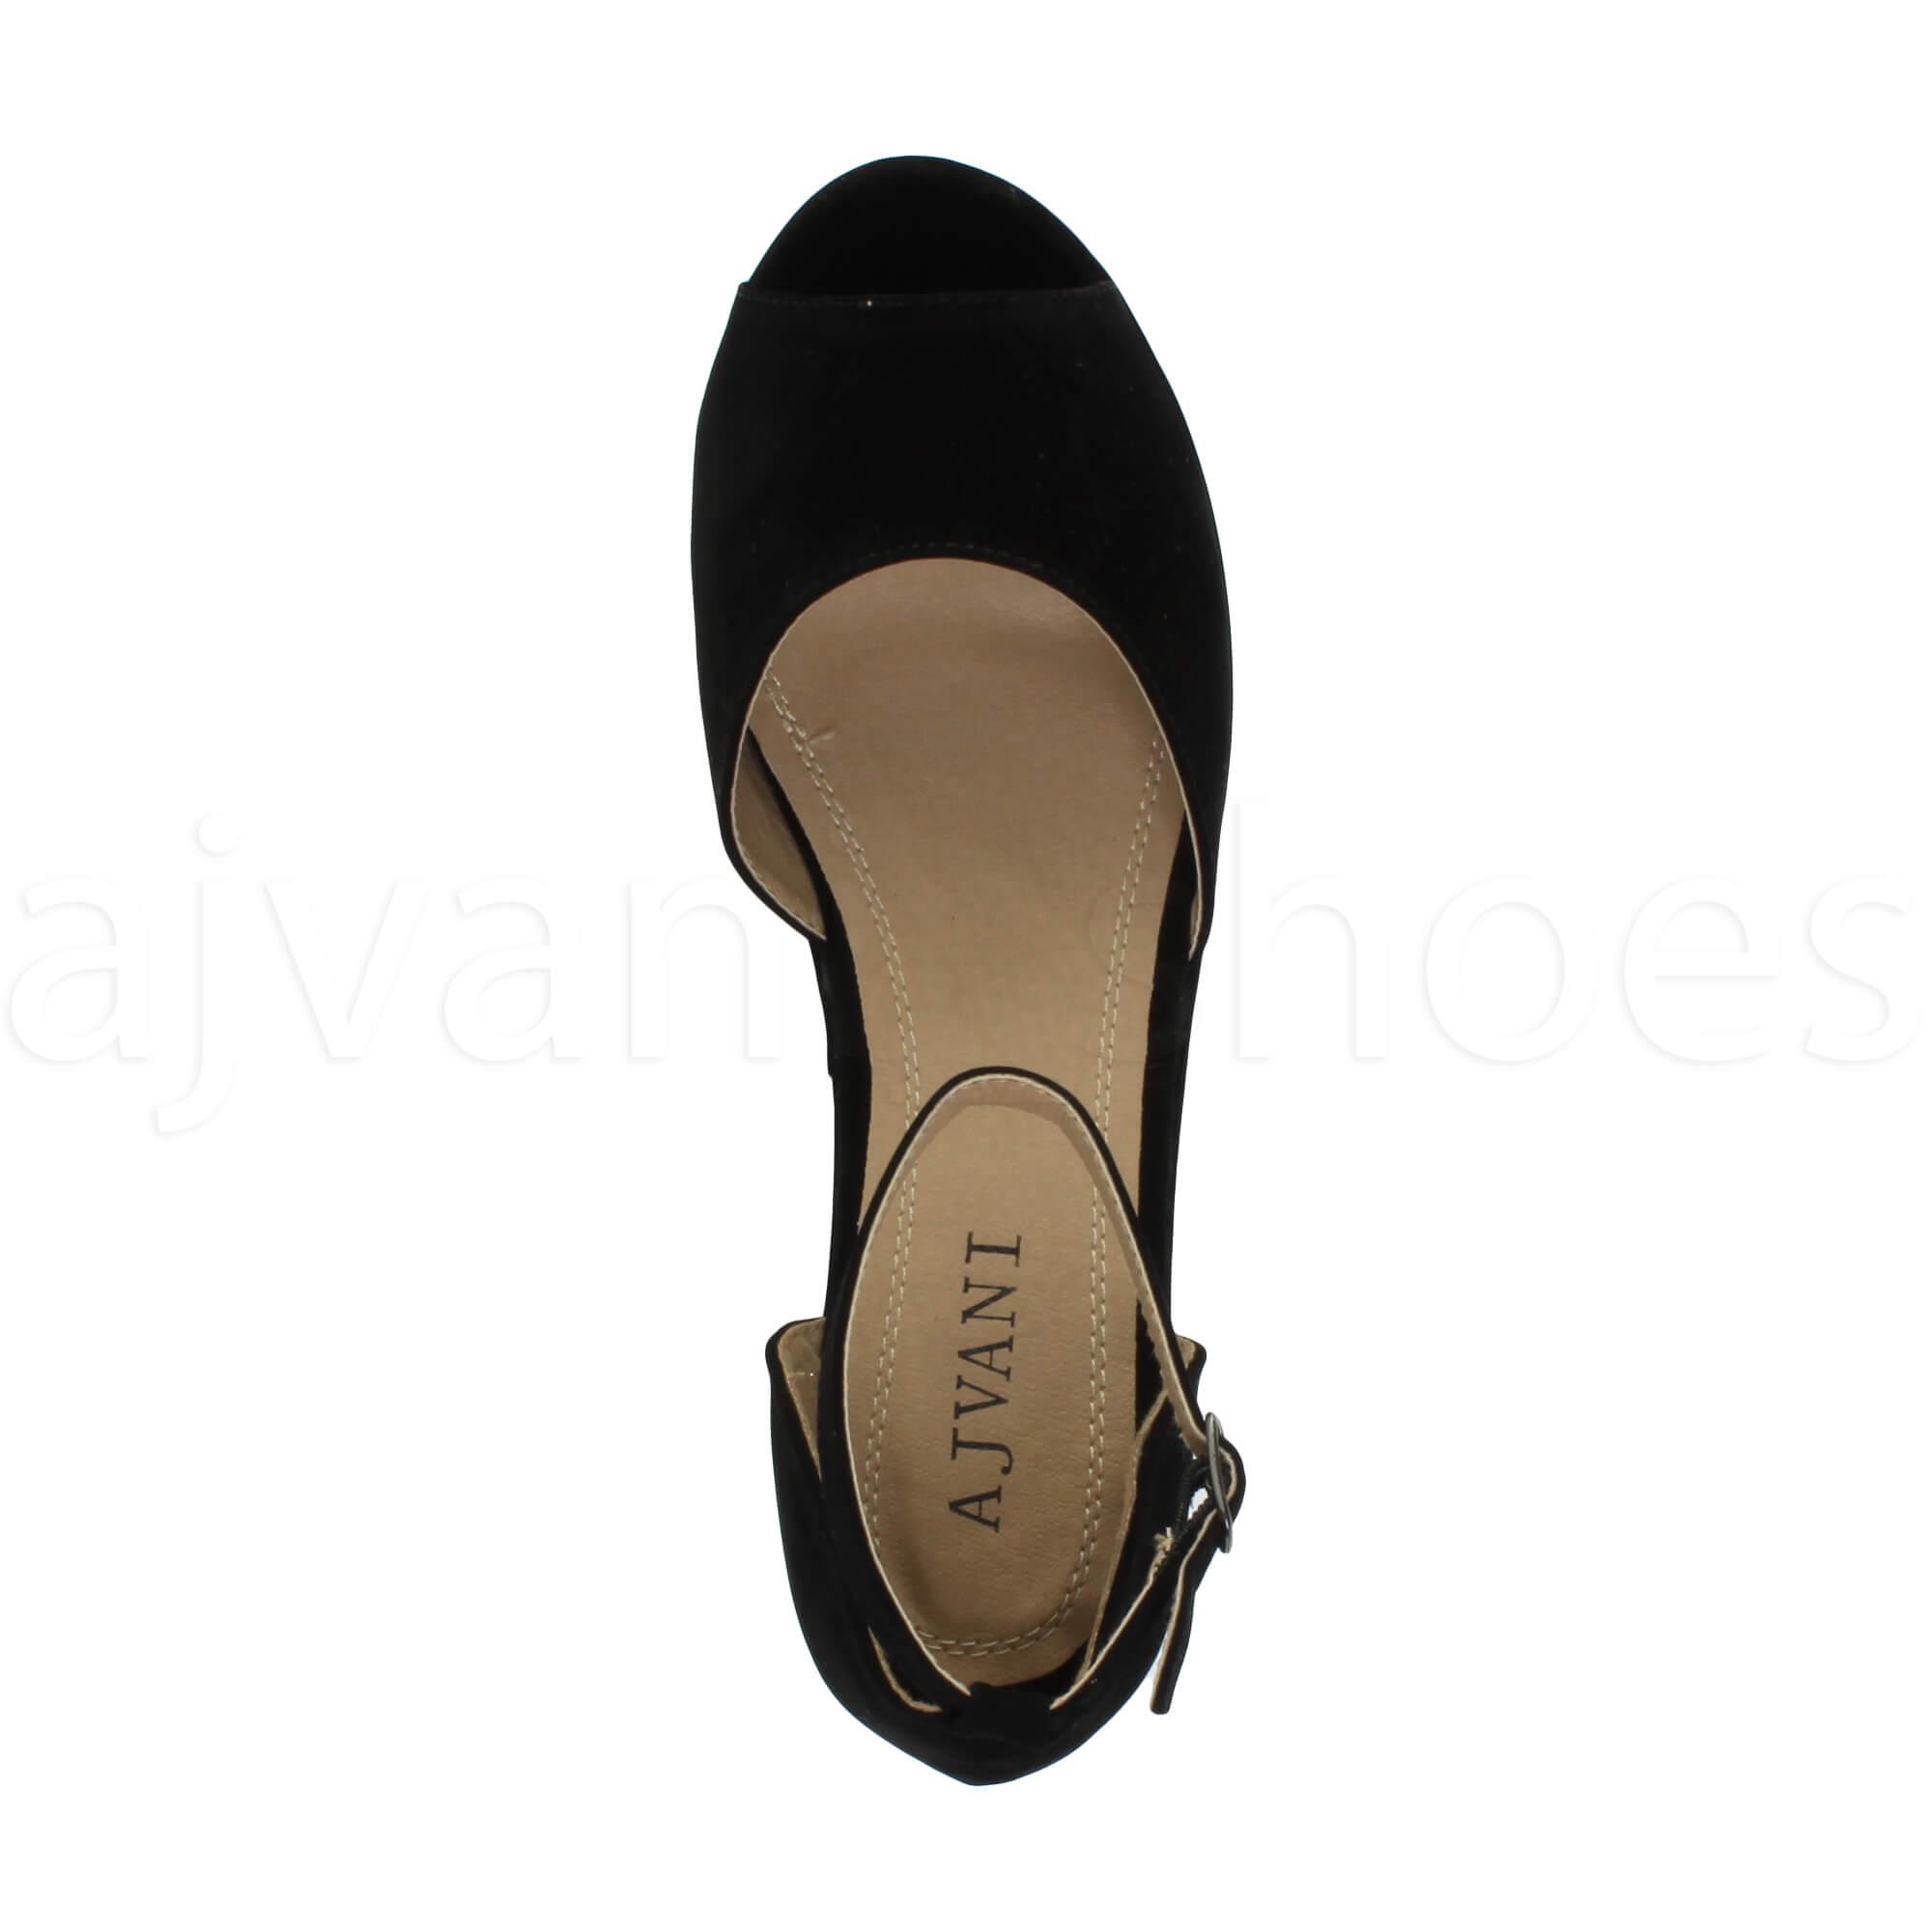 Mujeres-medio-de-cuna-talon-plataforma-flatform-punta-abierta-sandalias-talla